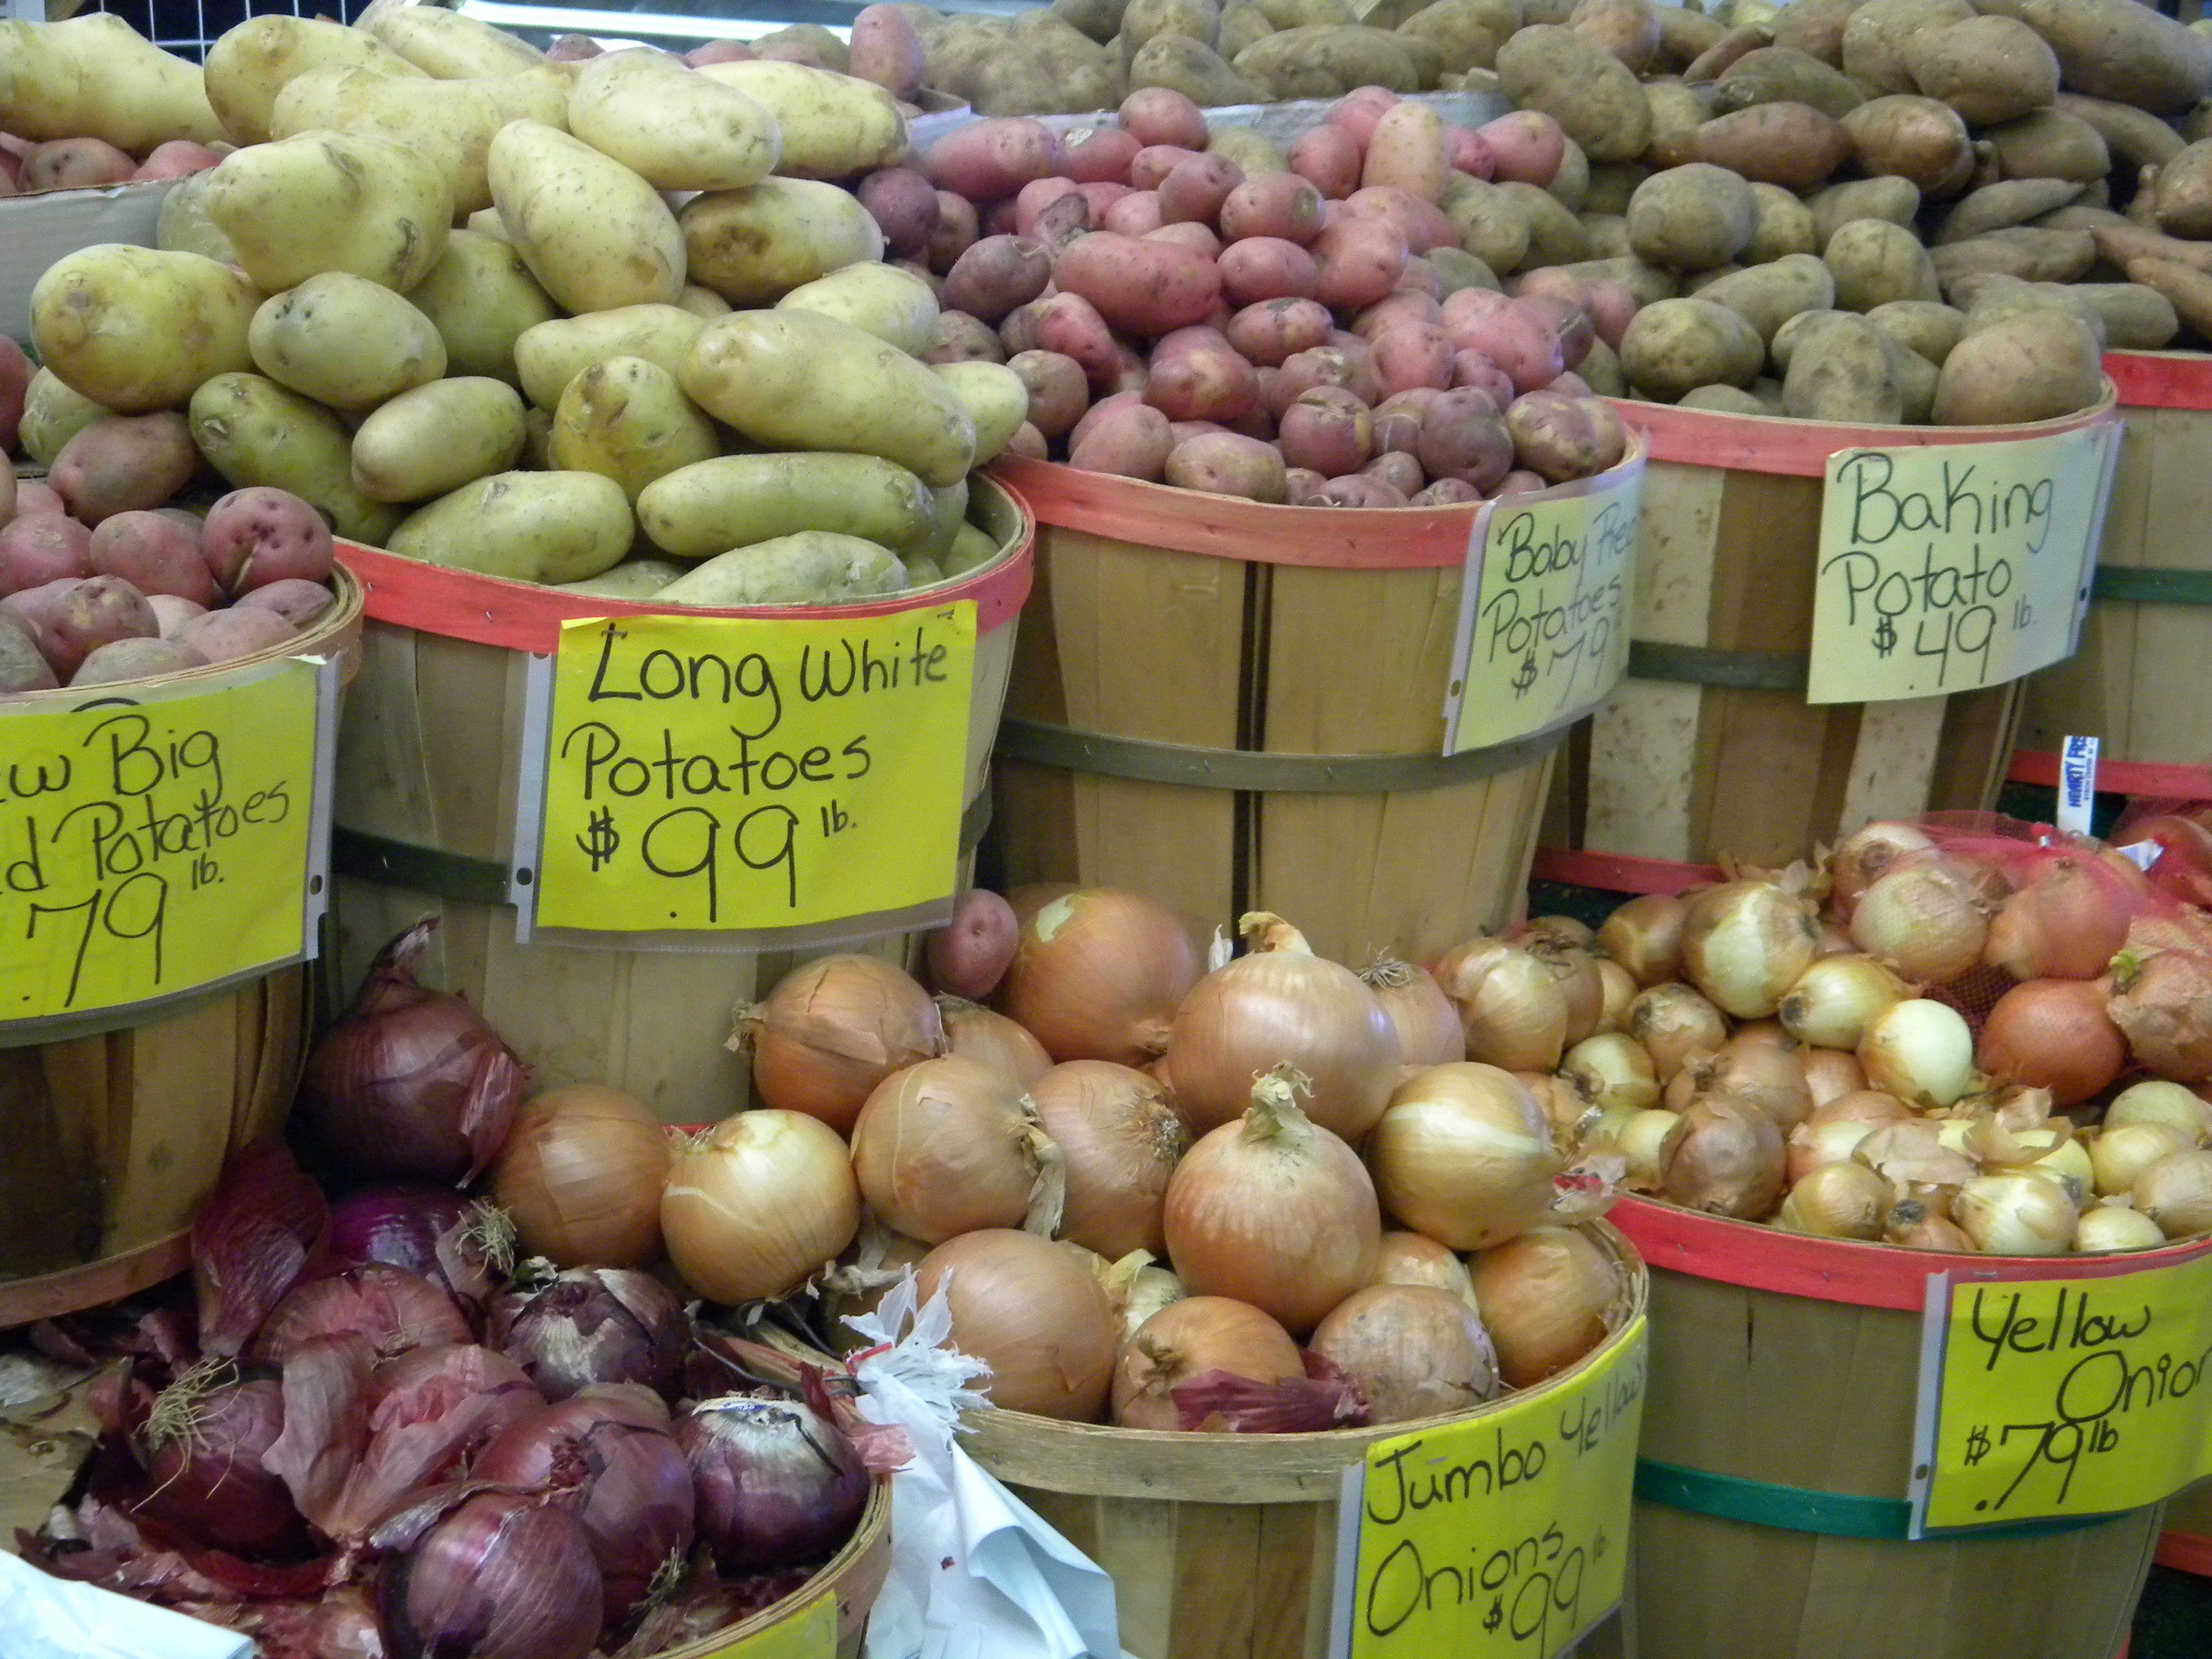 Onions potatoes greensboro farmers market gso benttuba